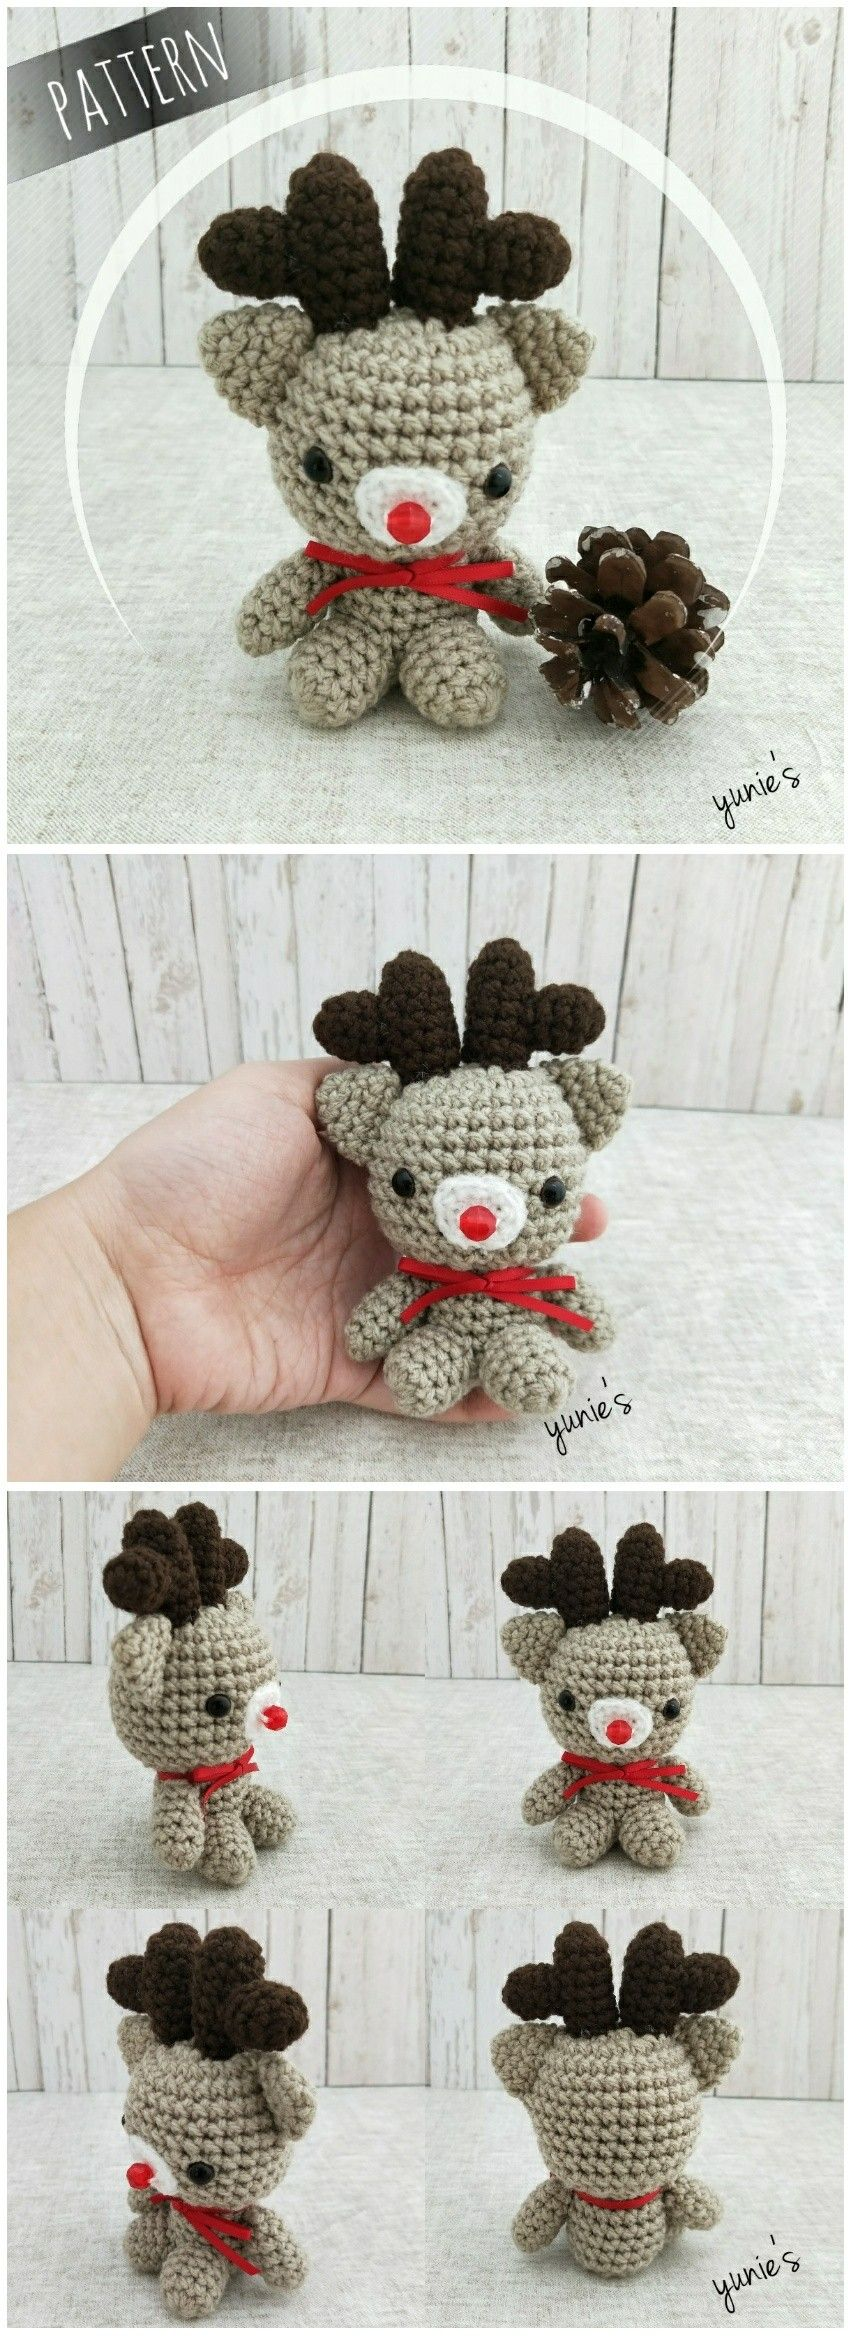 Crochet Reindeer Pattern Crochet Rudolph Amigurumi Pattern Instant